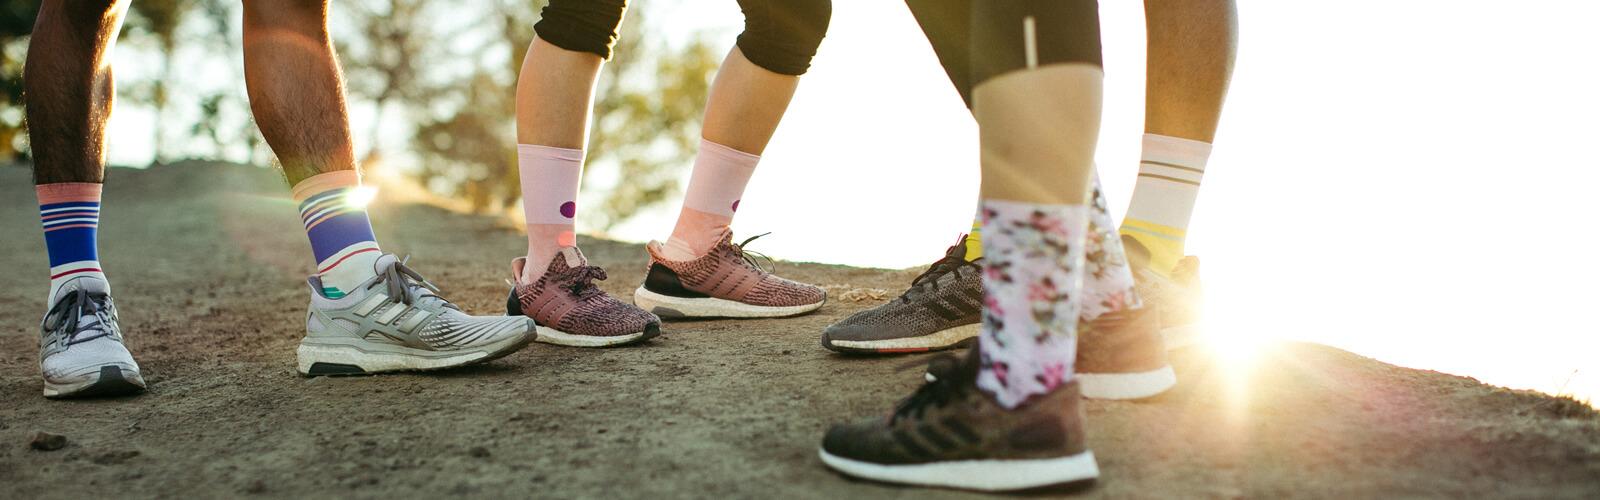 Stance running socks at runners retreat Marlow